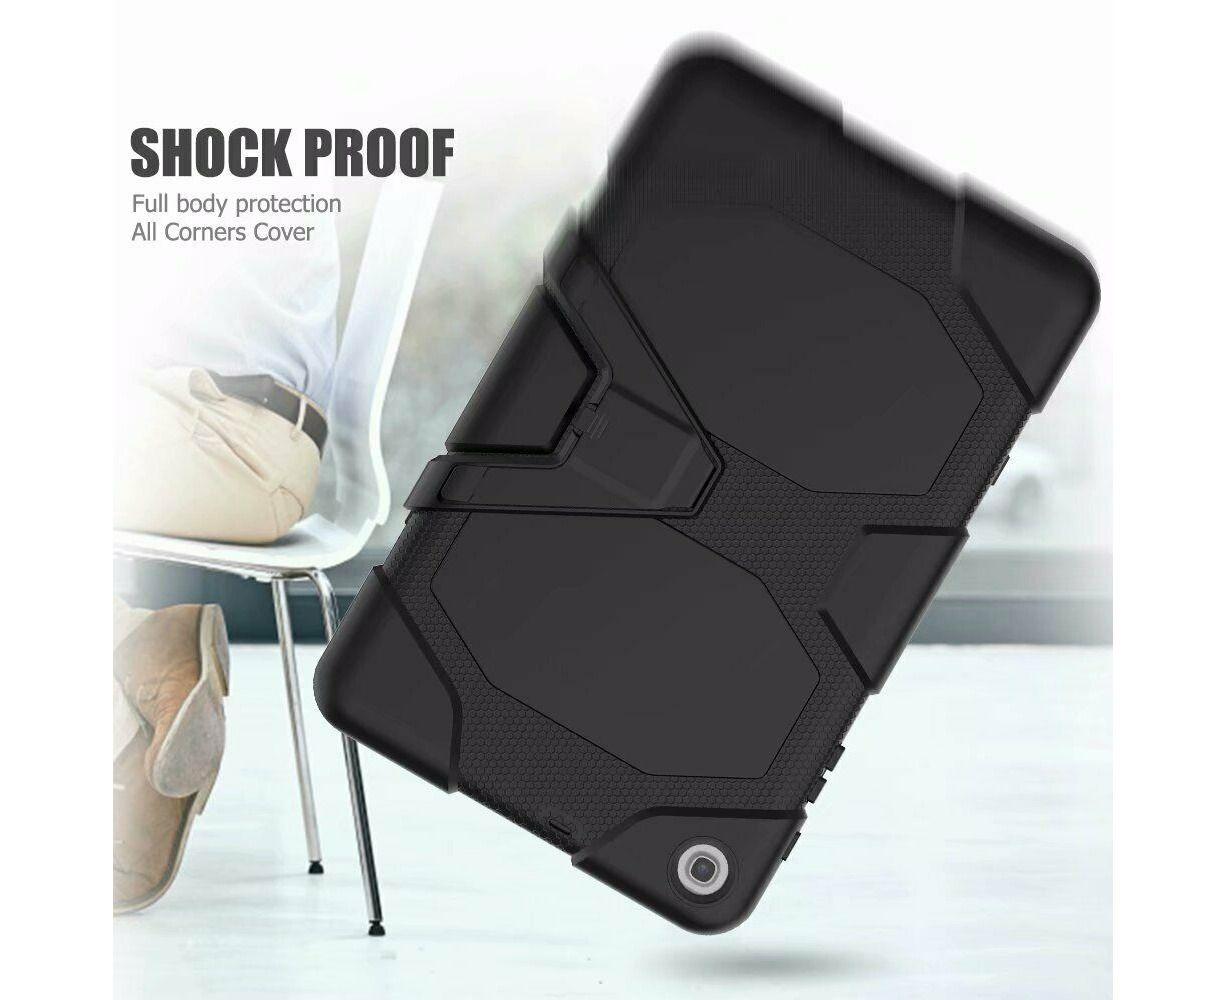 Capa Tablet Samsung Galaxy Tab A 10.1 SM T510 T515 Anti Queda Choque e Impacto